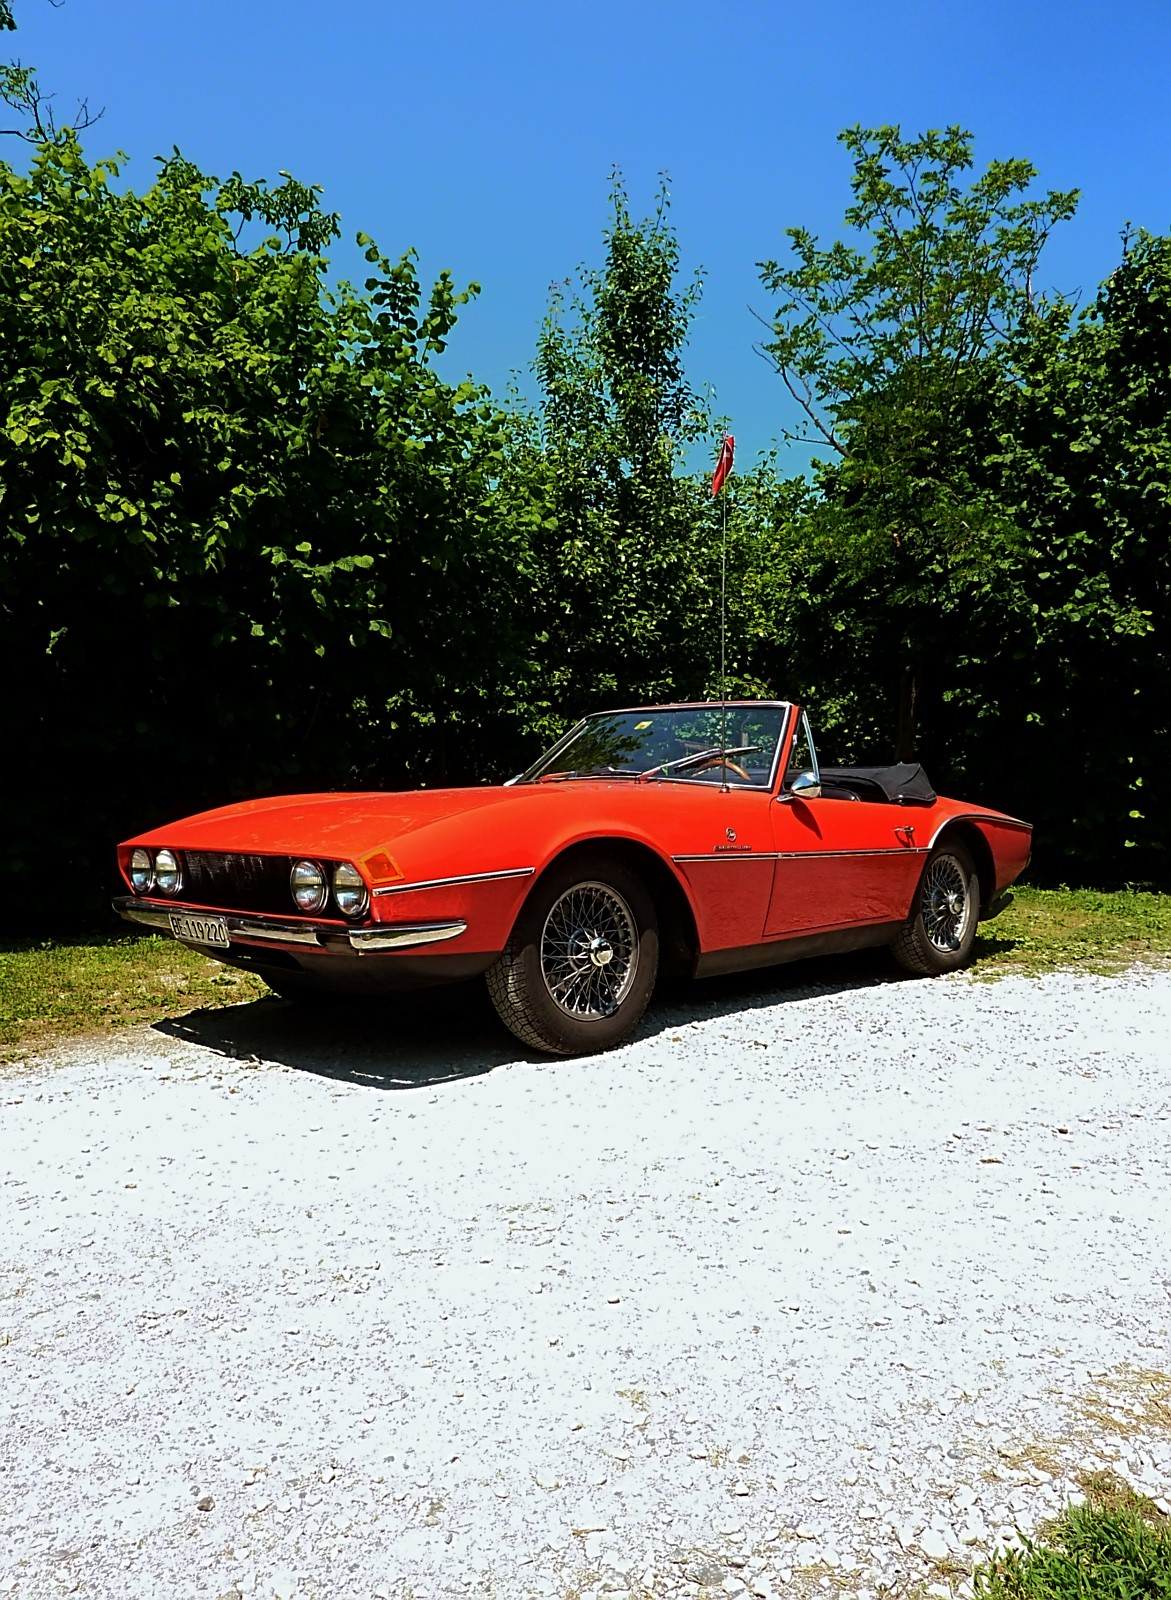 1968 Michelotti TR5 Ginevra Prototype (28)